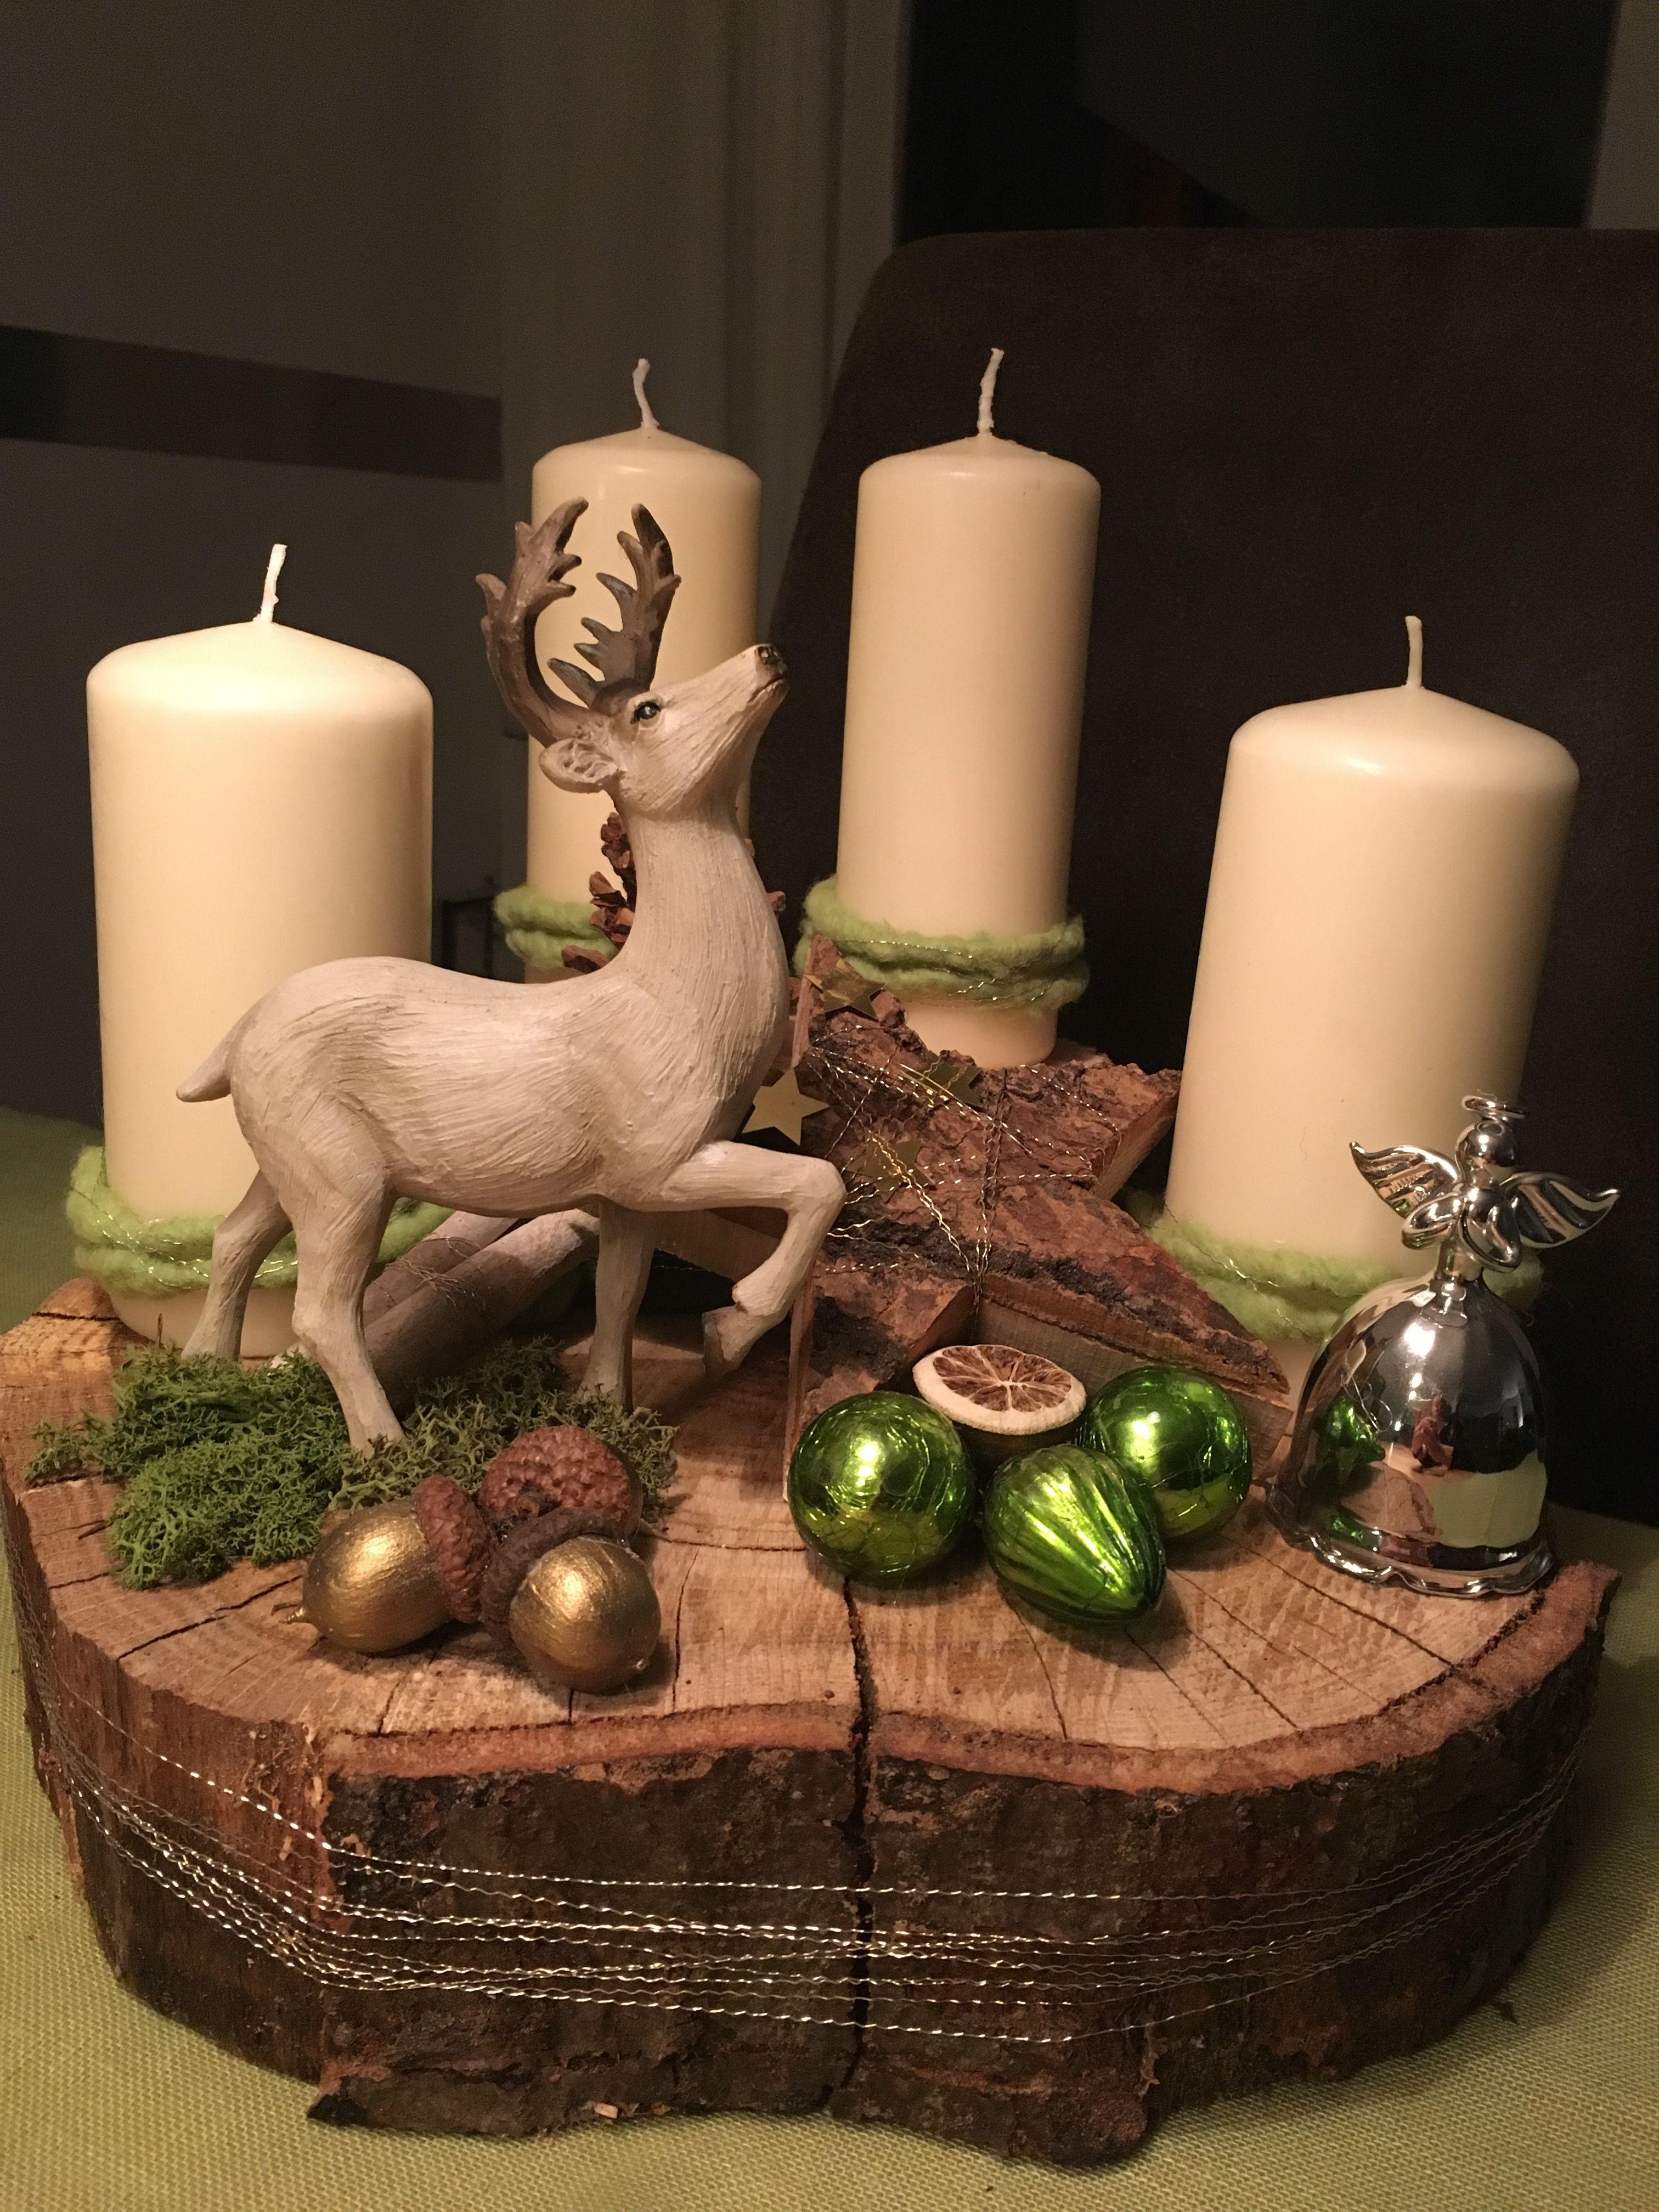 Navidad #baumscheibendekoweihnachten Navidad #adventskranzaufbaumscheibe